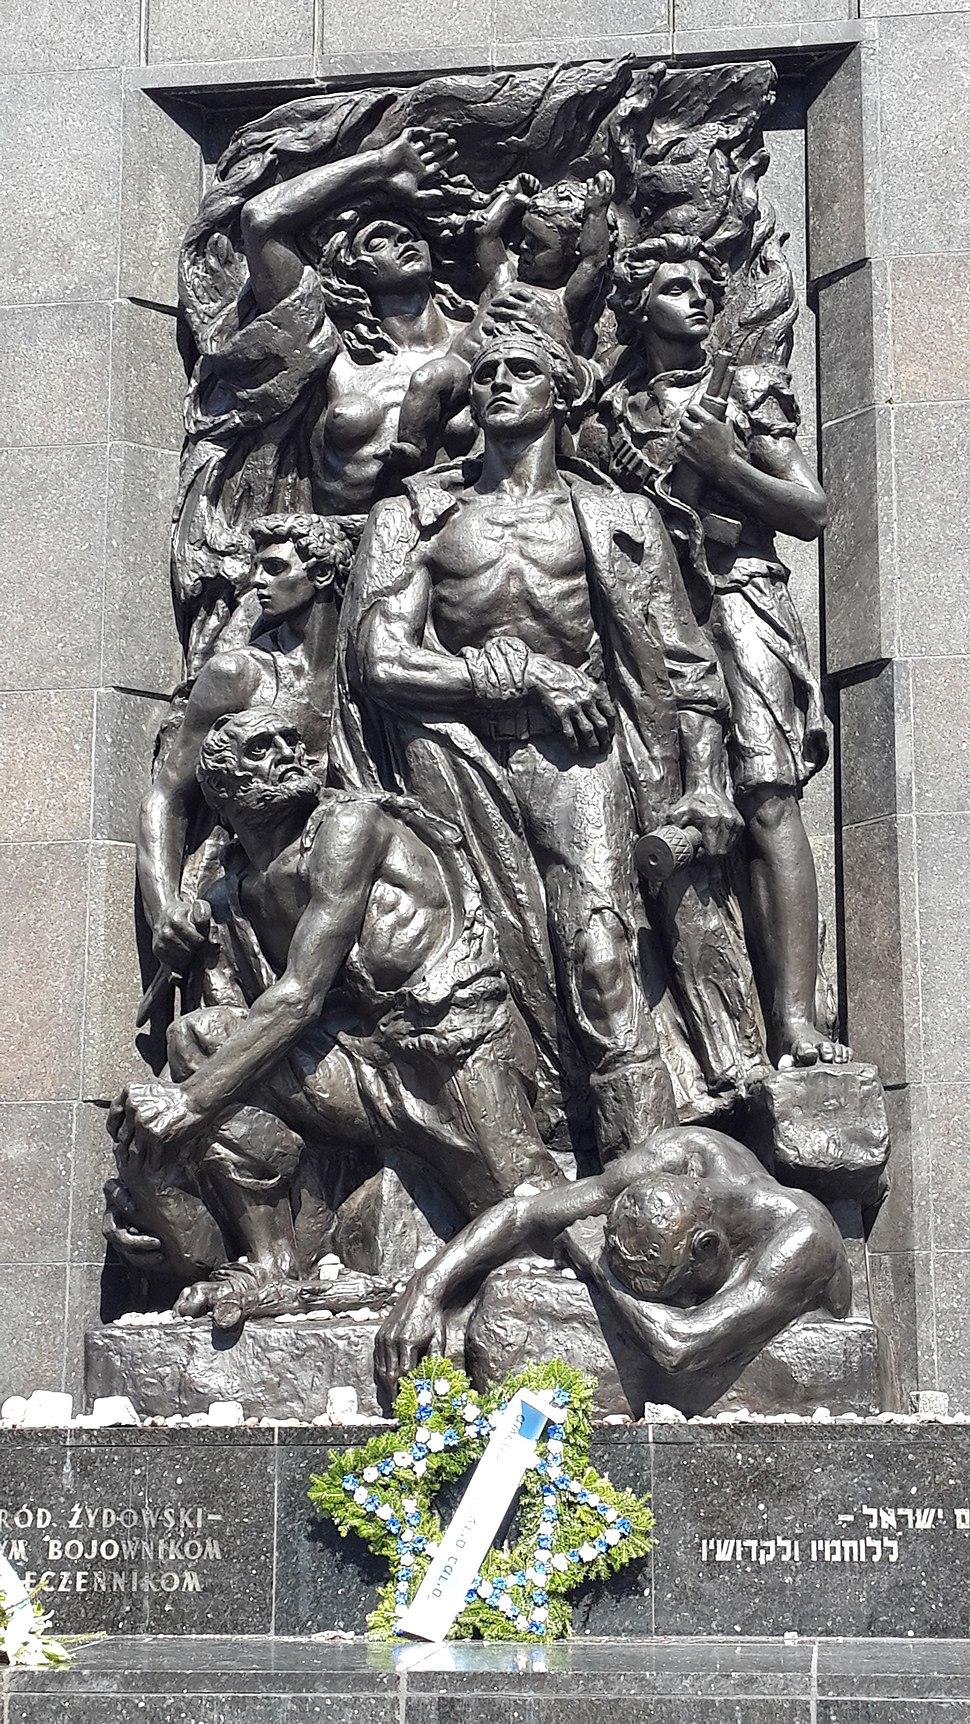 Natan Rapoport-Monument of Warsaw Ghetto Uprising in Warsaw-Warsaw